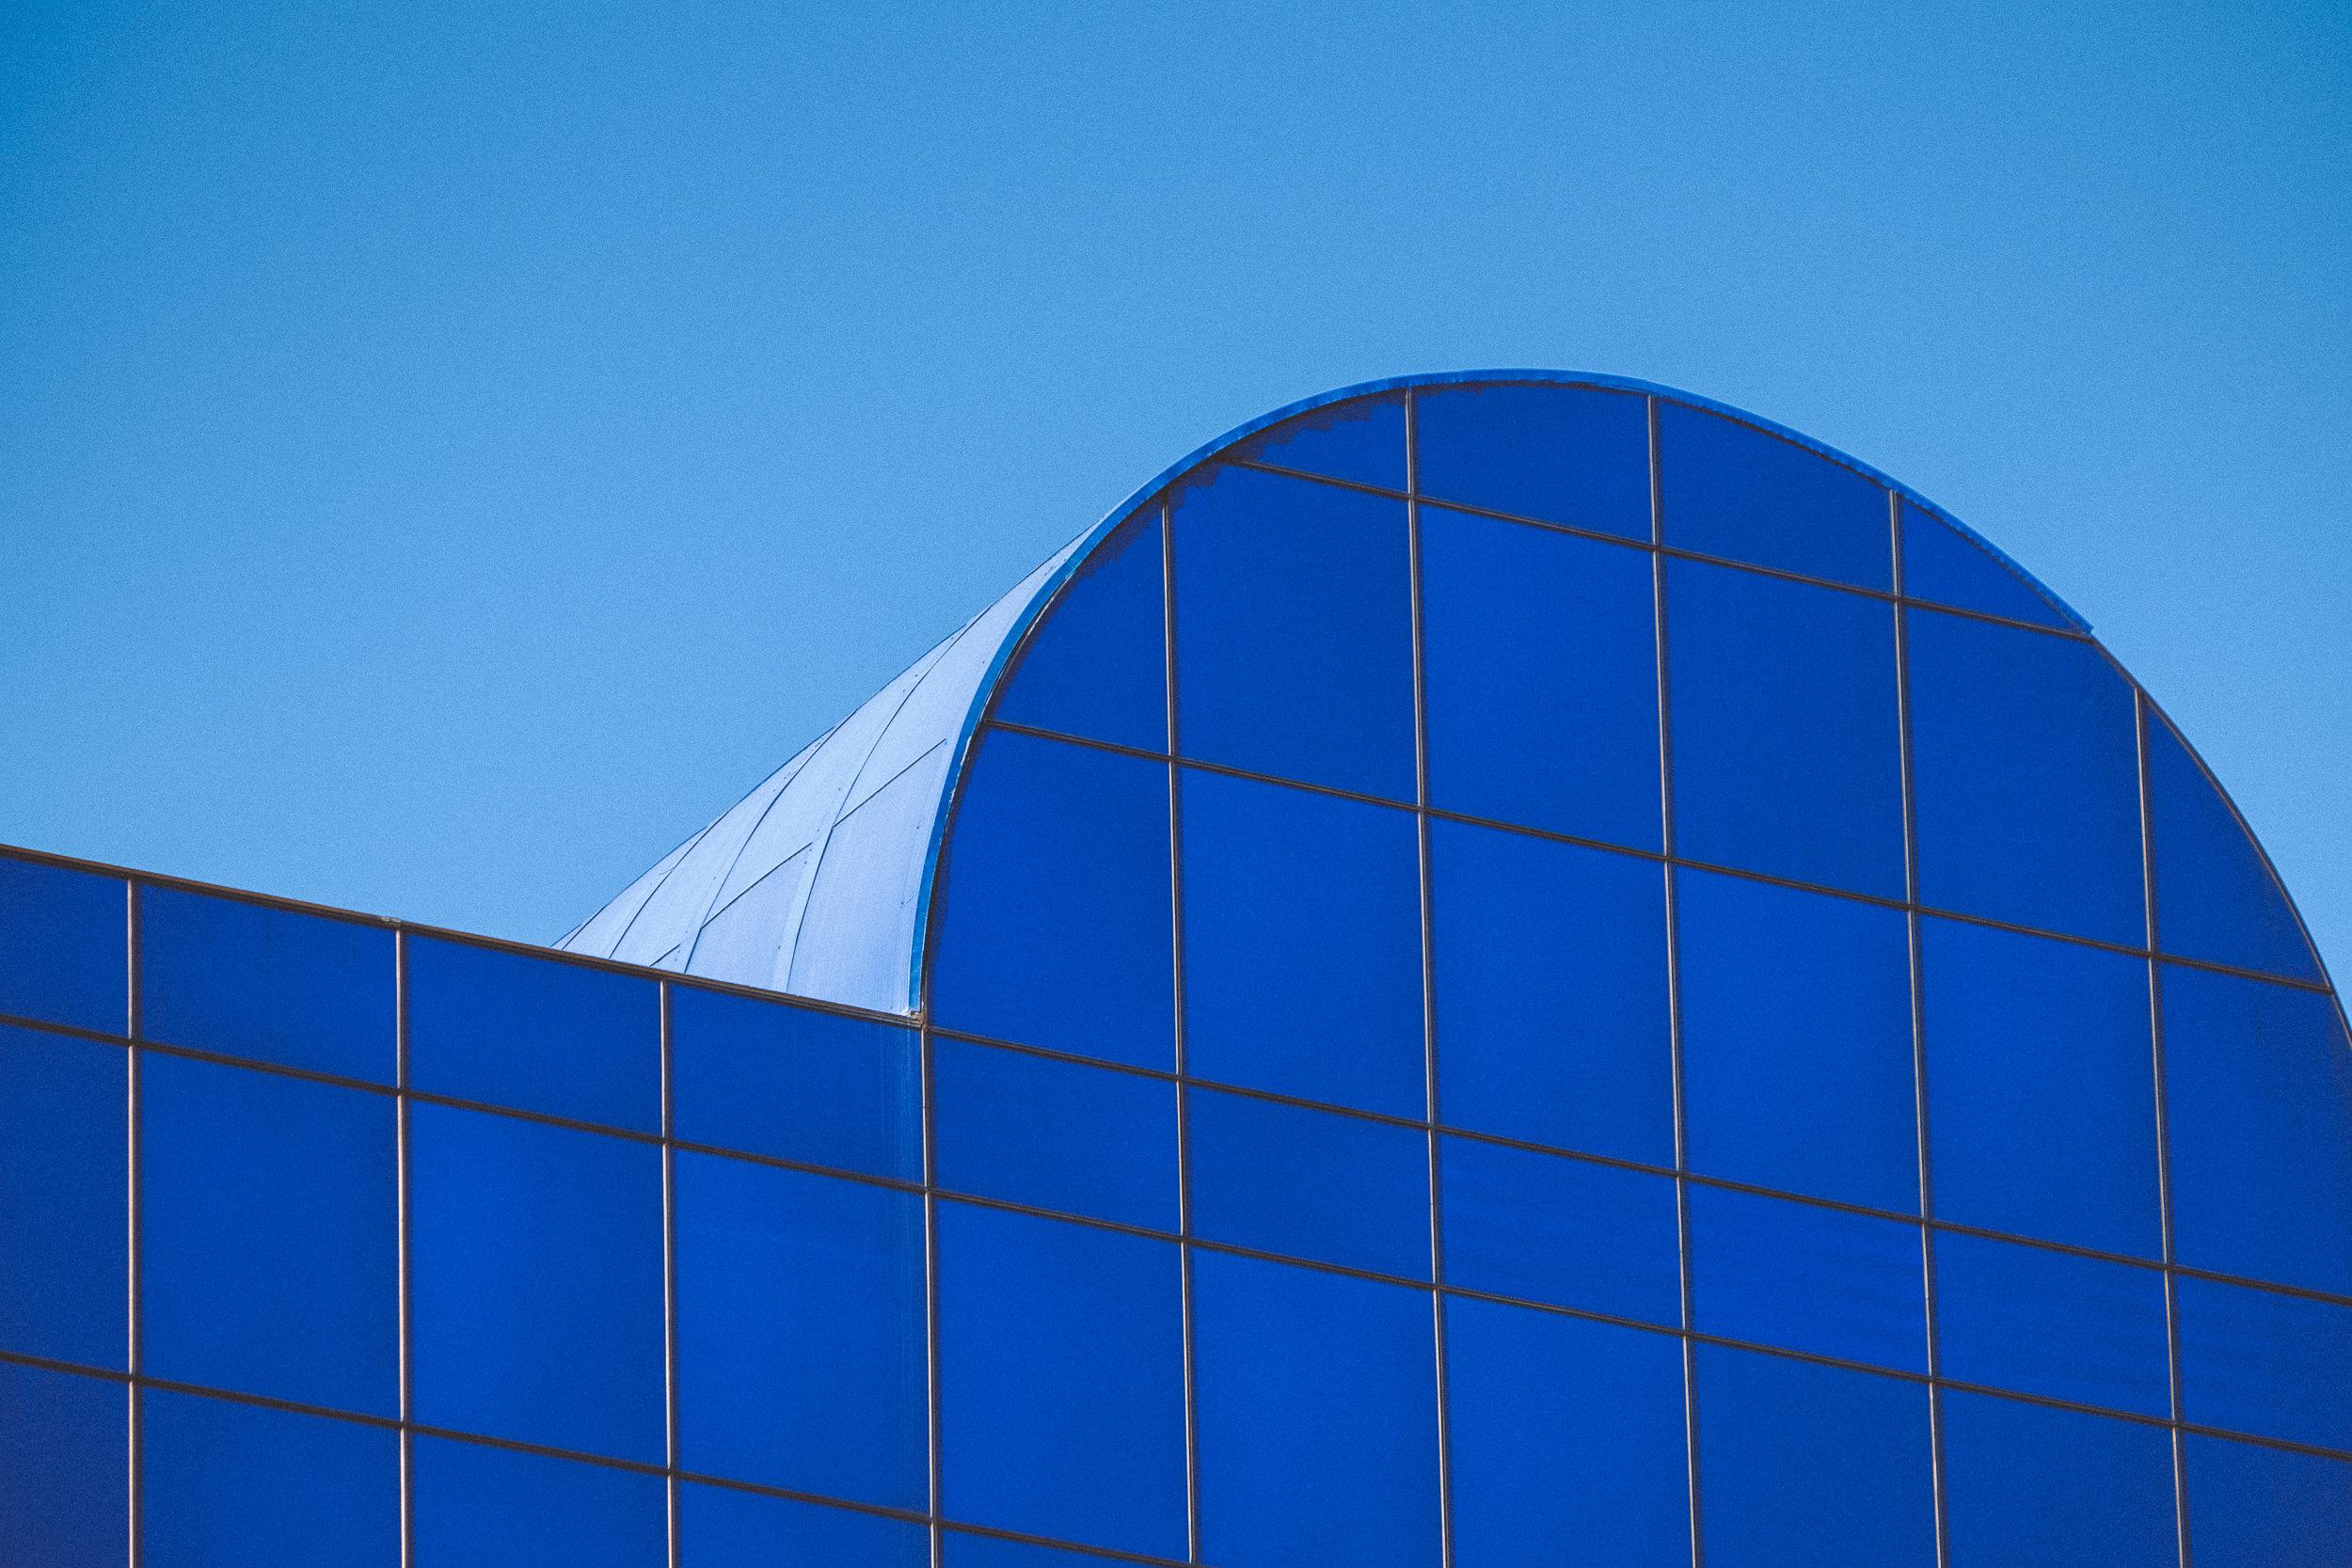 Los Angeles, Pacific Design Center BLUE Building